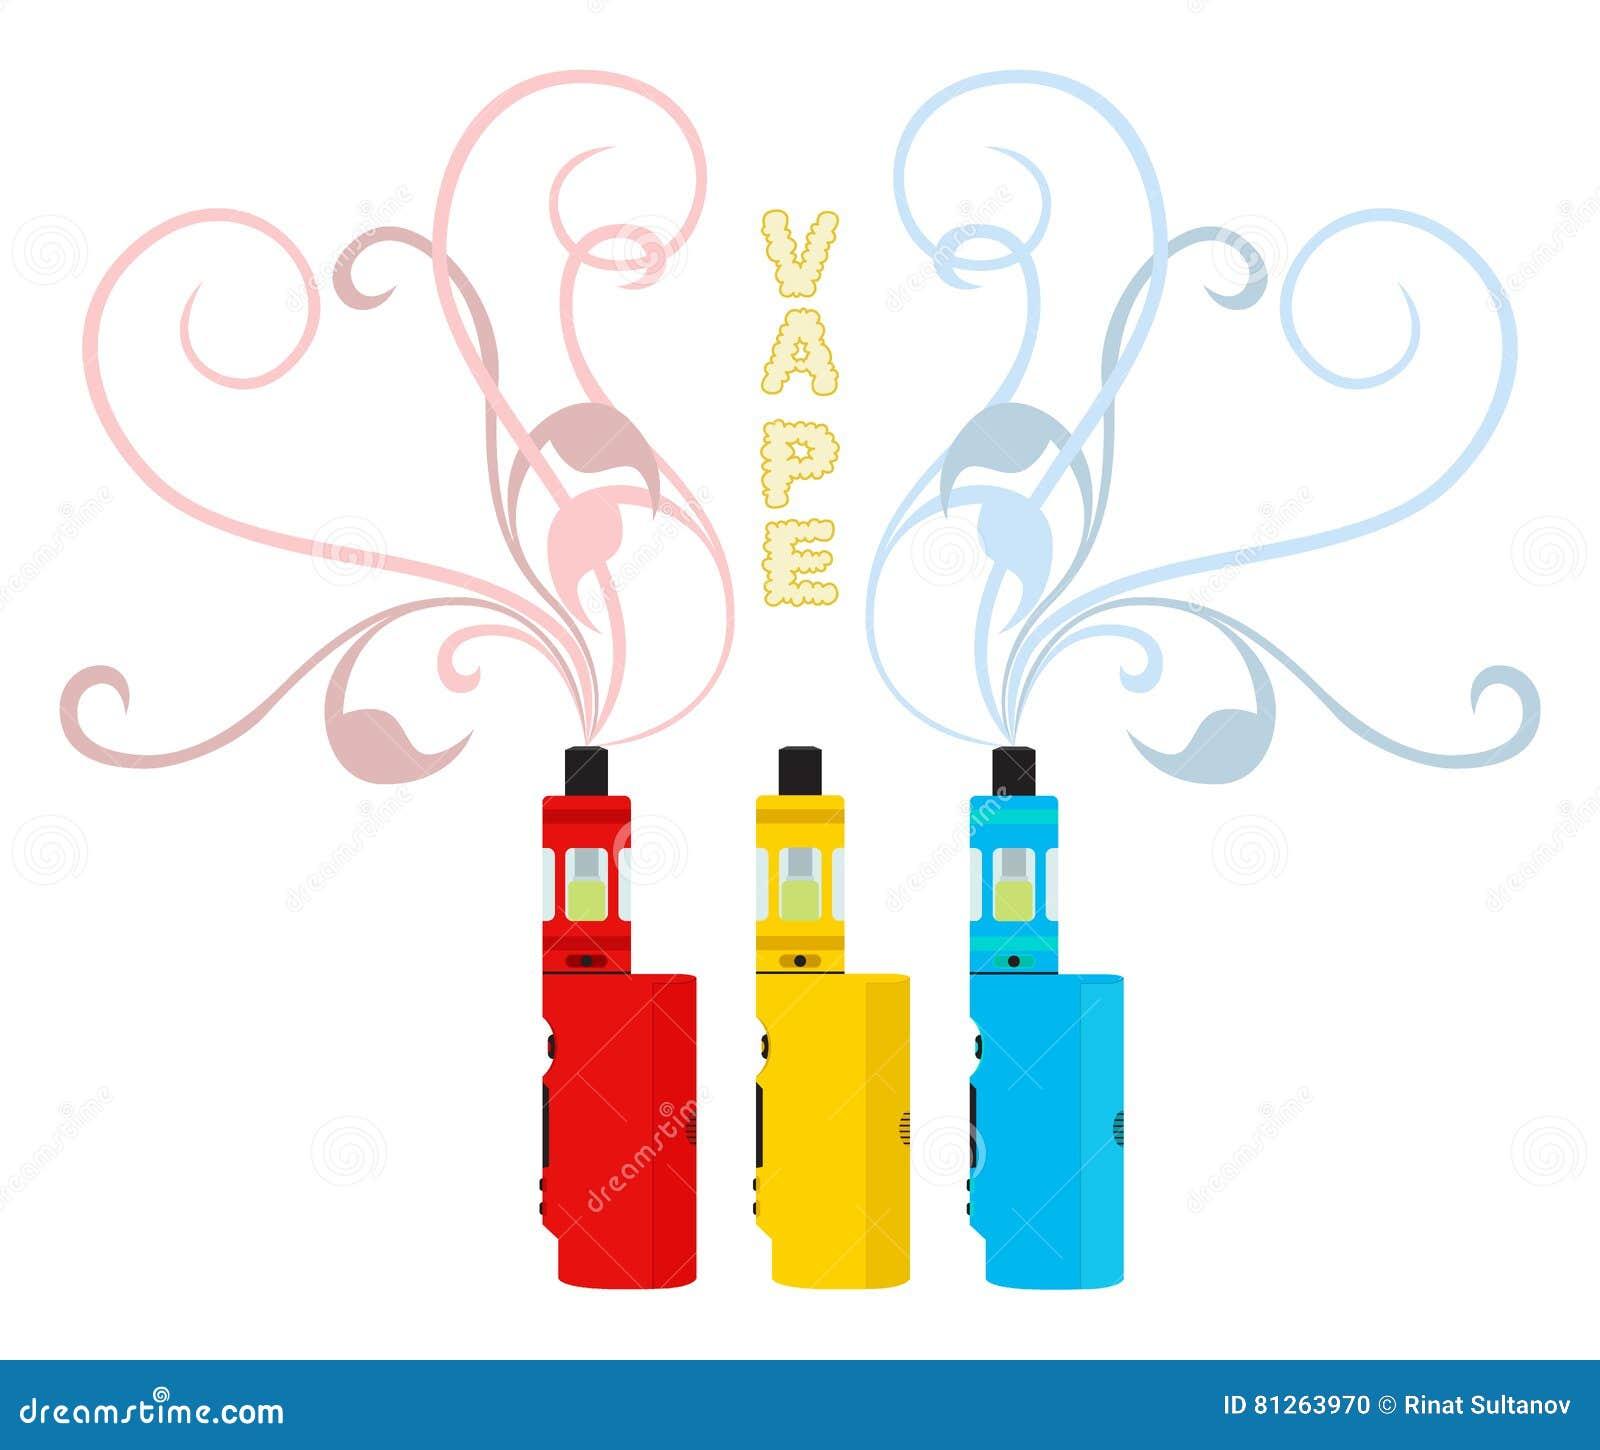 Bright Vape Devices Set  Vaping Liquid, Smoke Inhaler  Flat